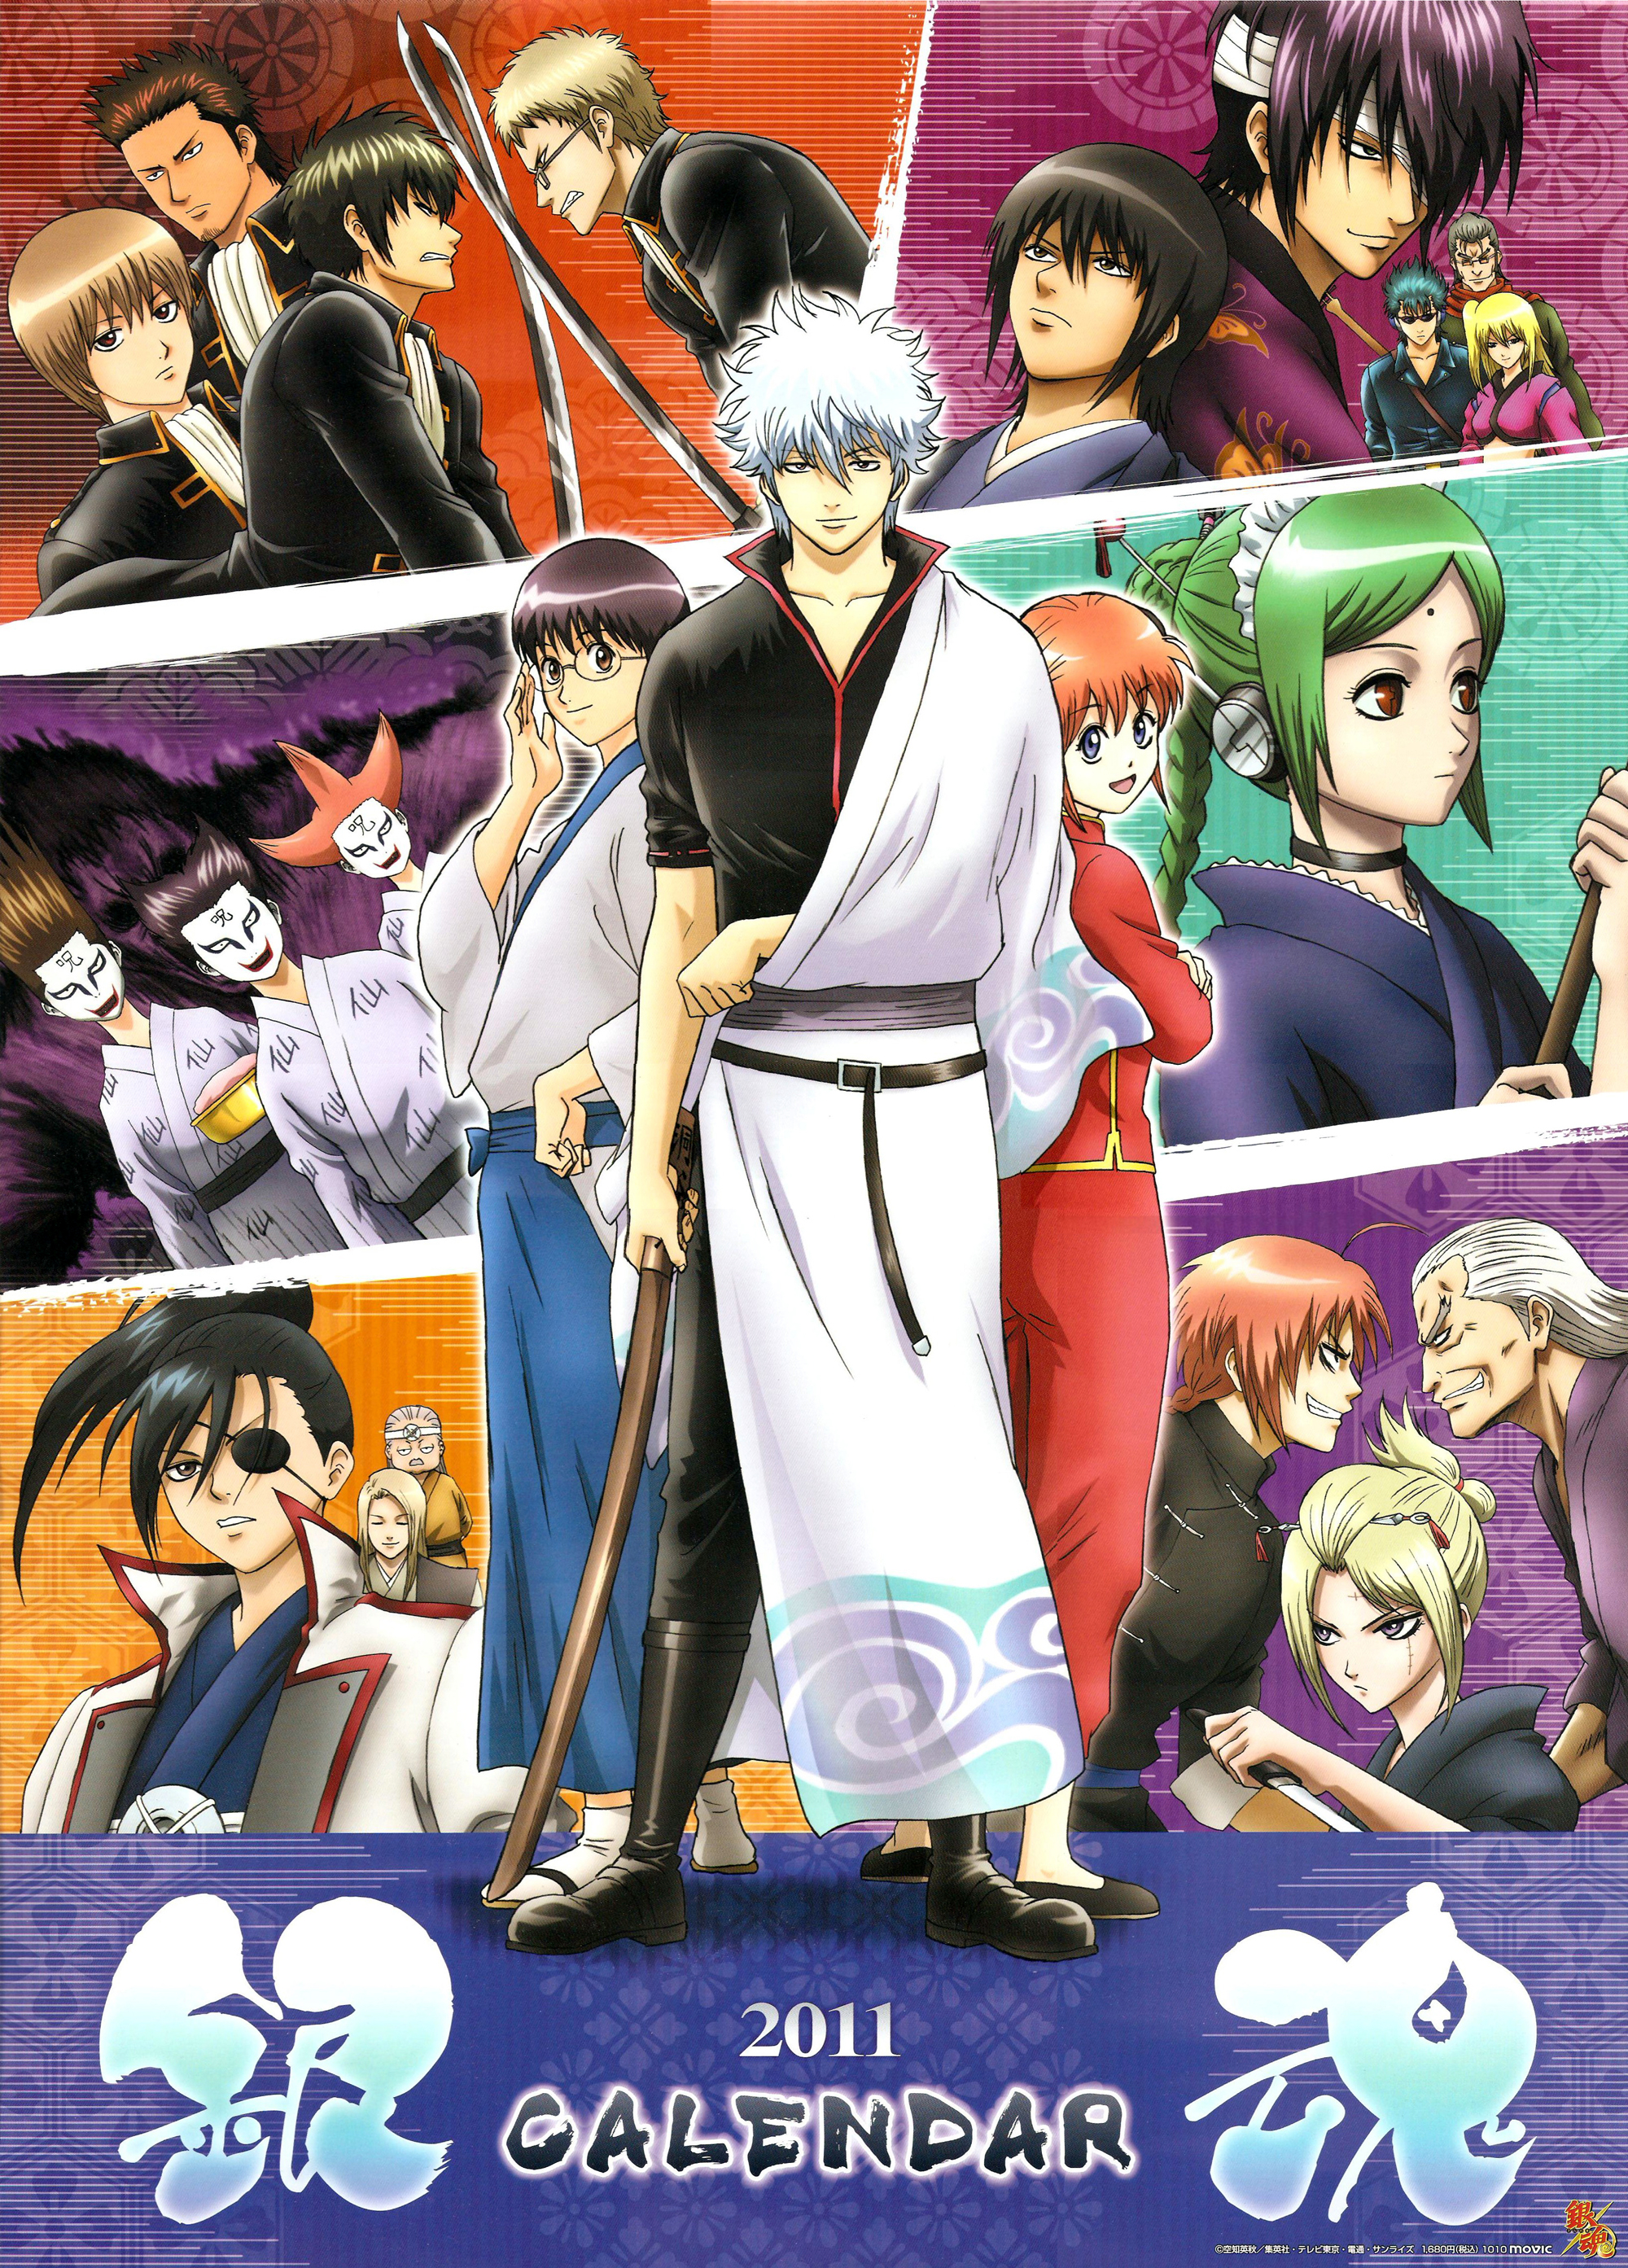 Shinsengumi Rebellion Arc Gintama Zerochan Anime Image Board